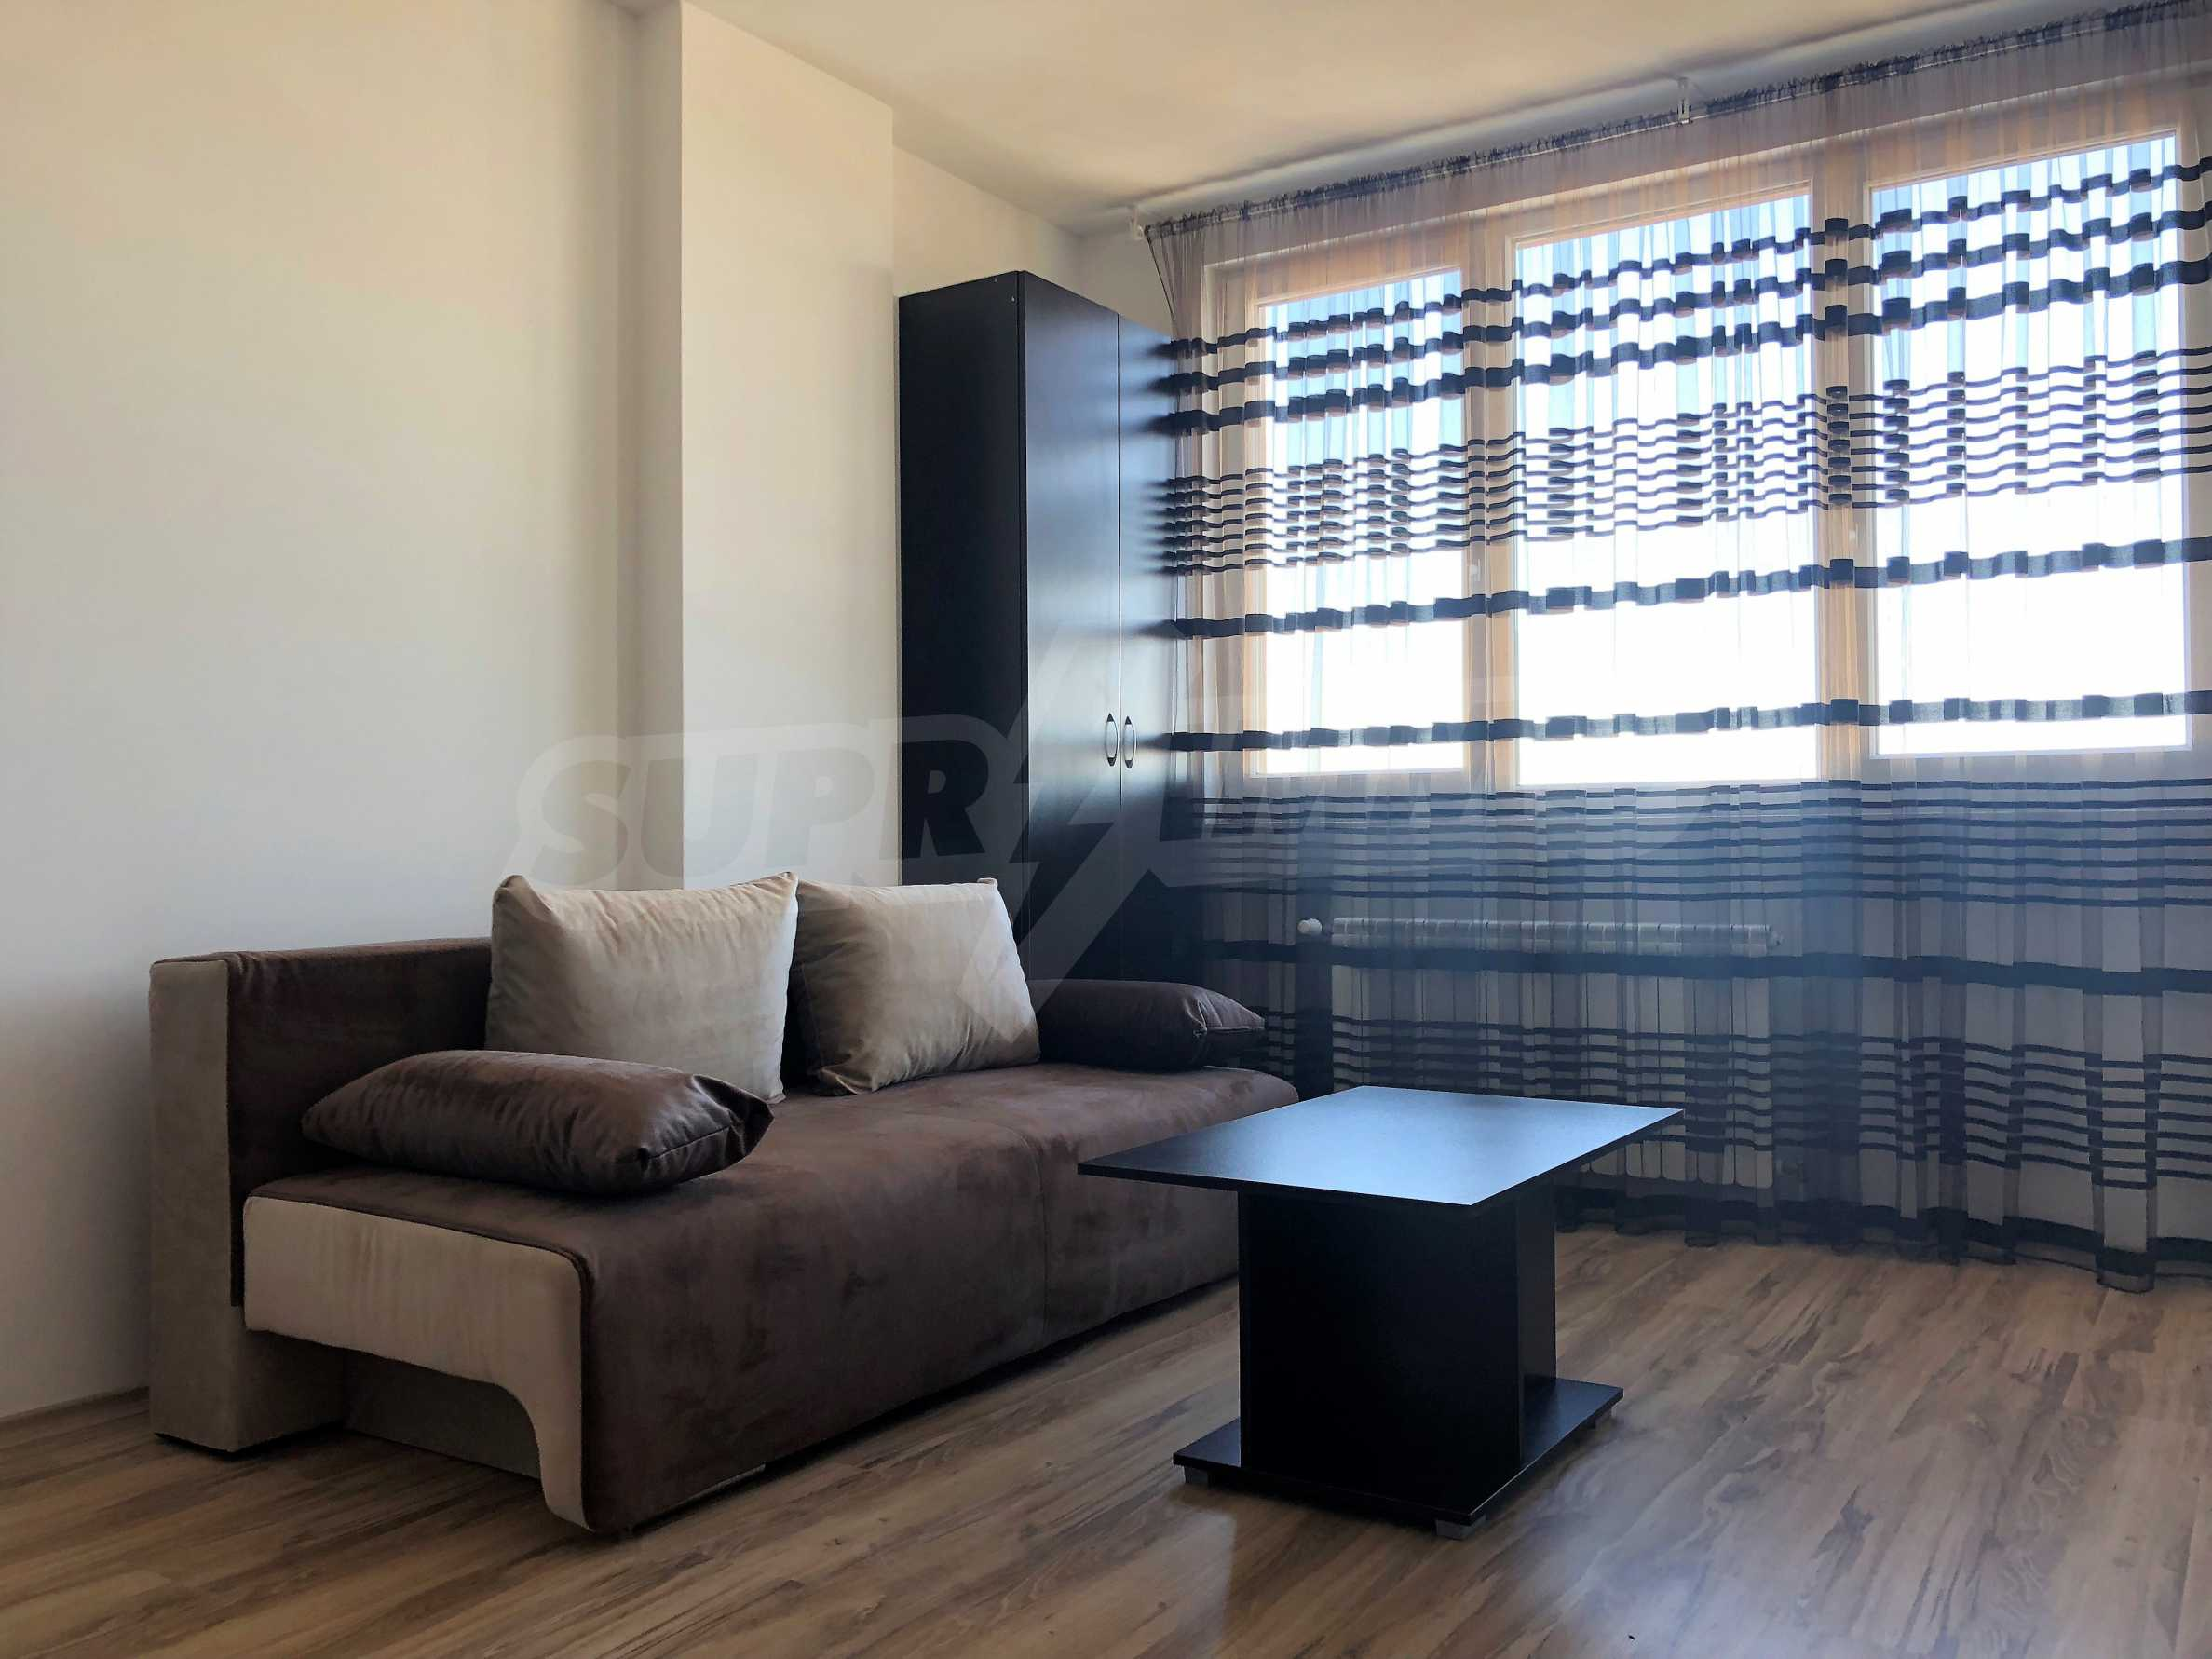 1-bedroom apartment for rent in Sofia, Bulgaria - For rent - 1-bedroom apartment.